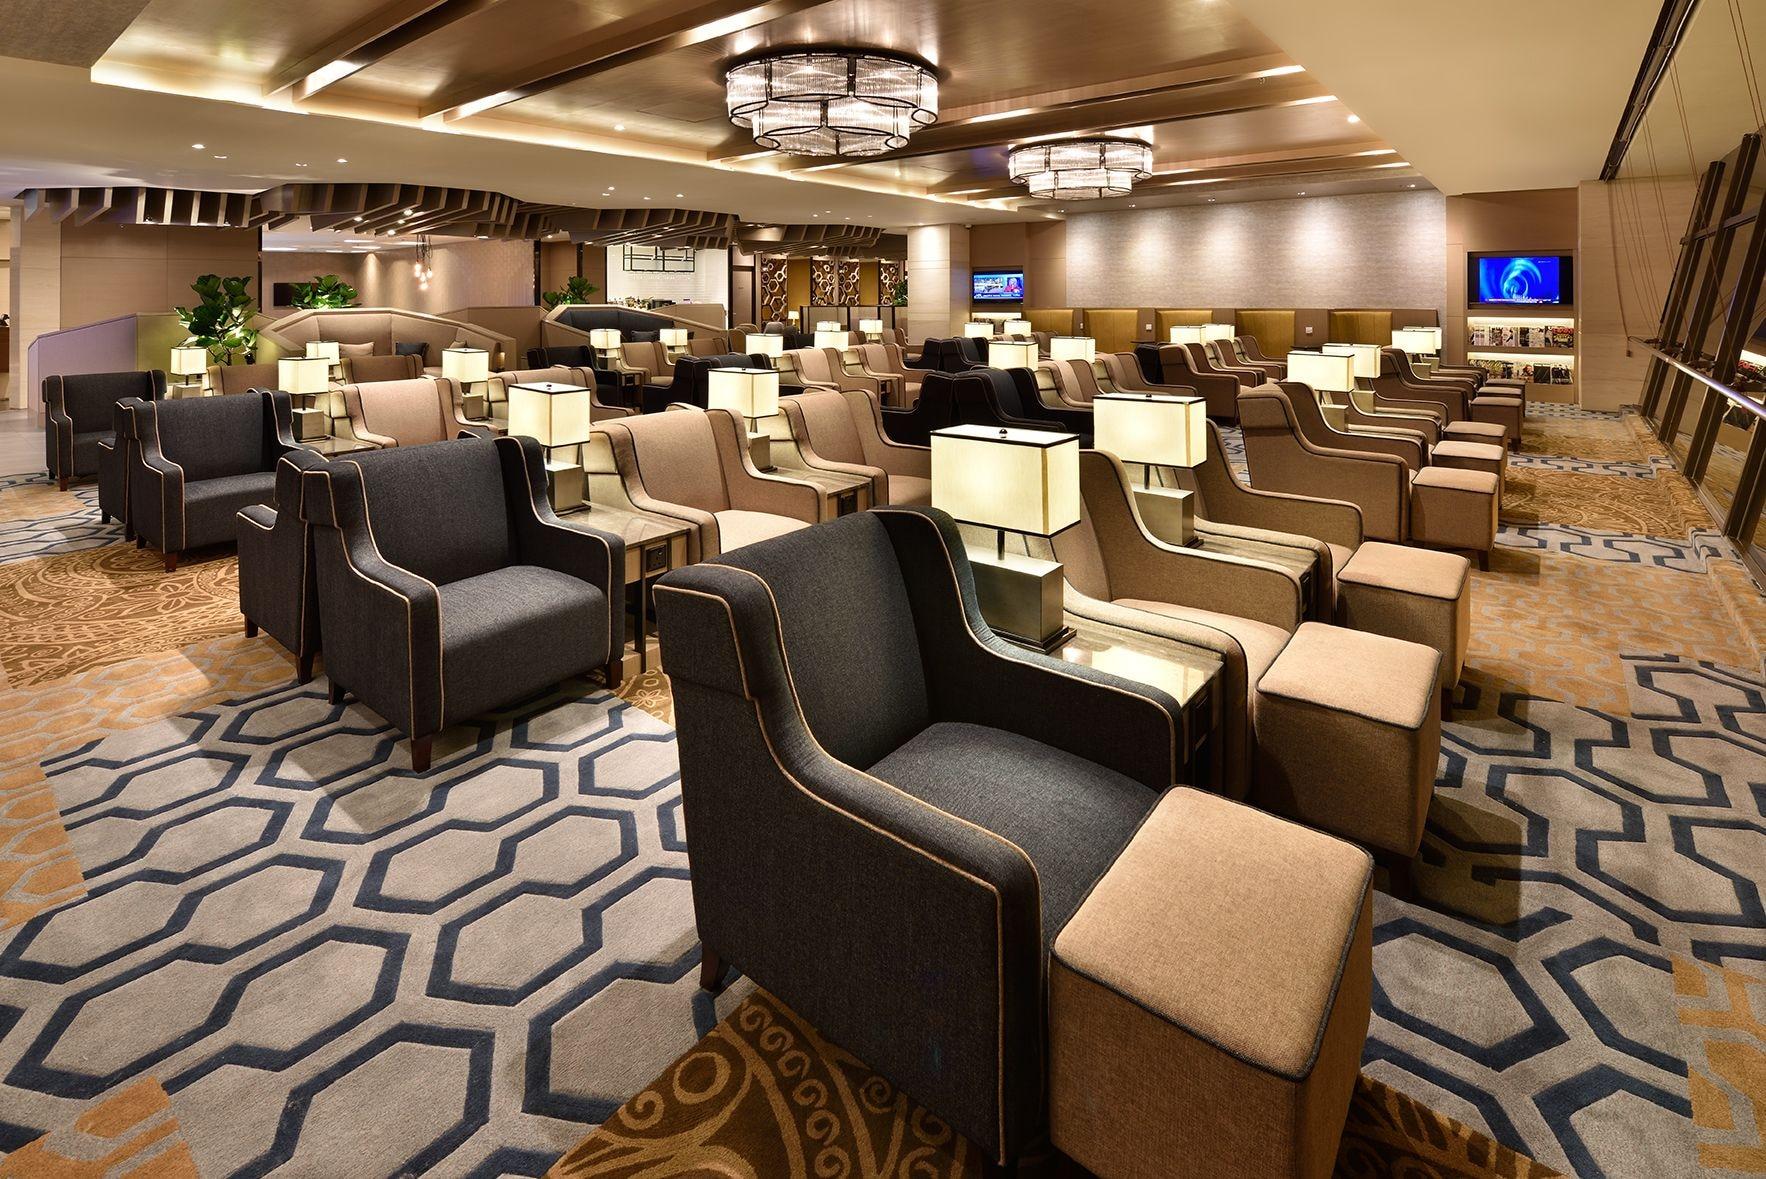 Plaza Premium Lounge  - Singapore T1, Changi